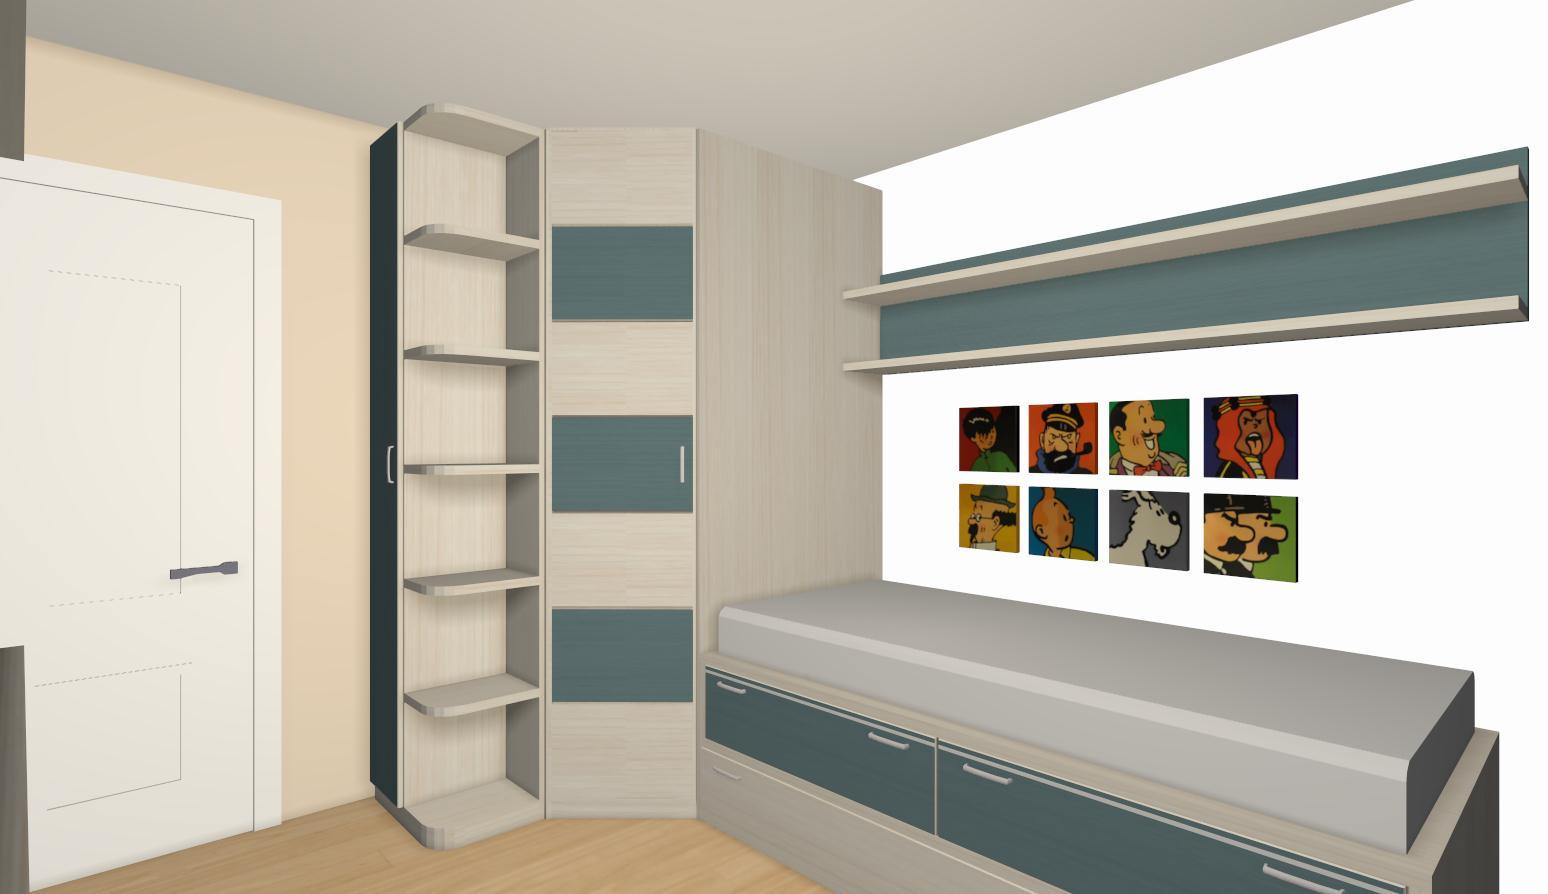 Muebles Para Esquinas Mueble Bao Para Esquina Mueble Bao Para  # Pequenos Gigantes Muebles